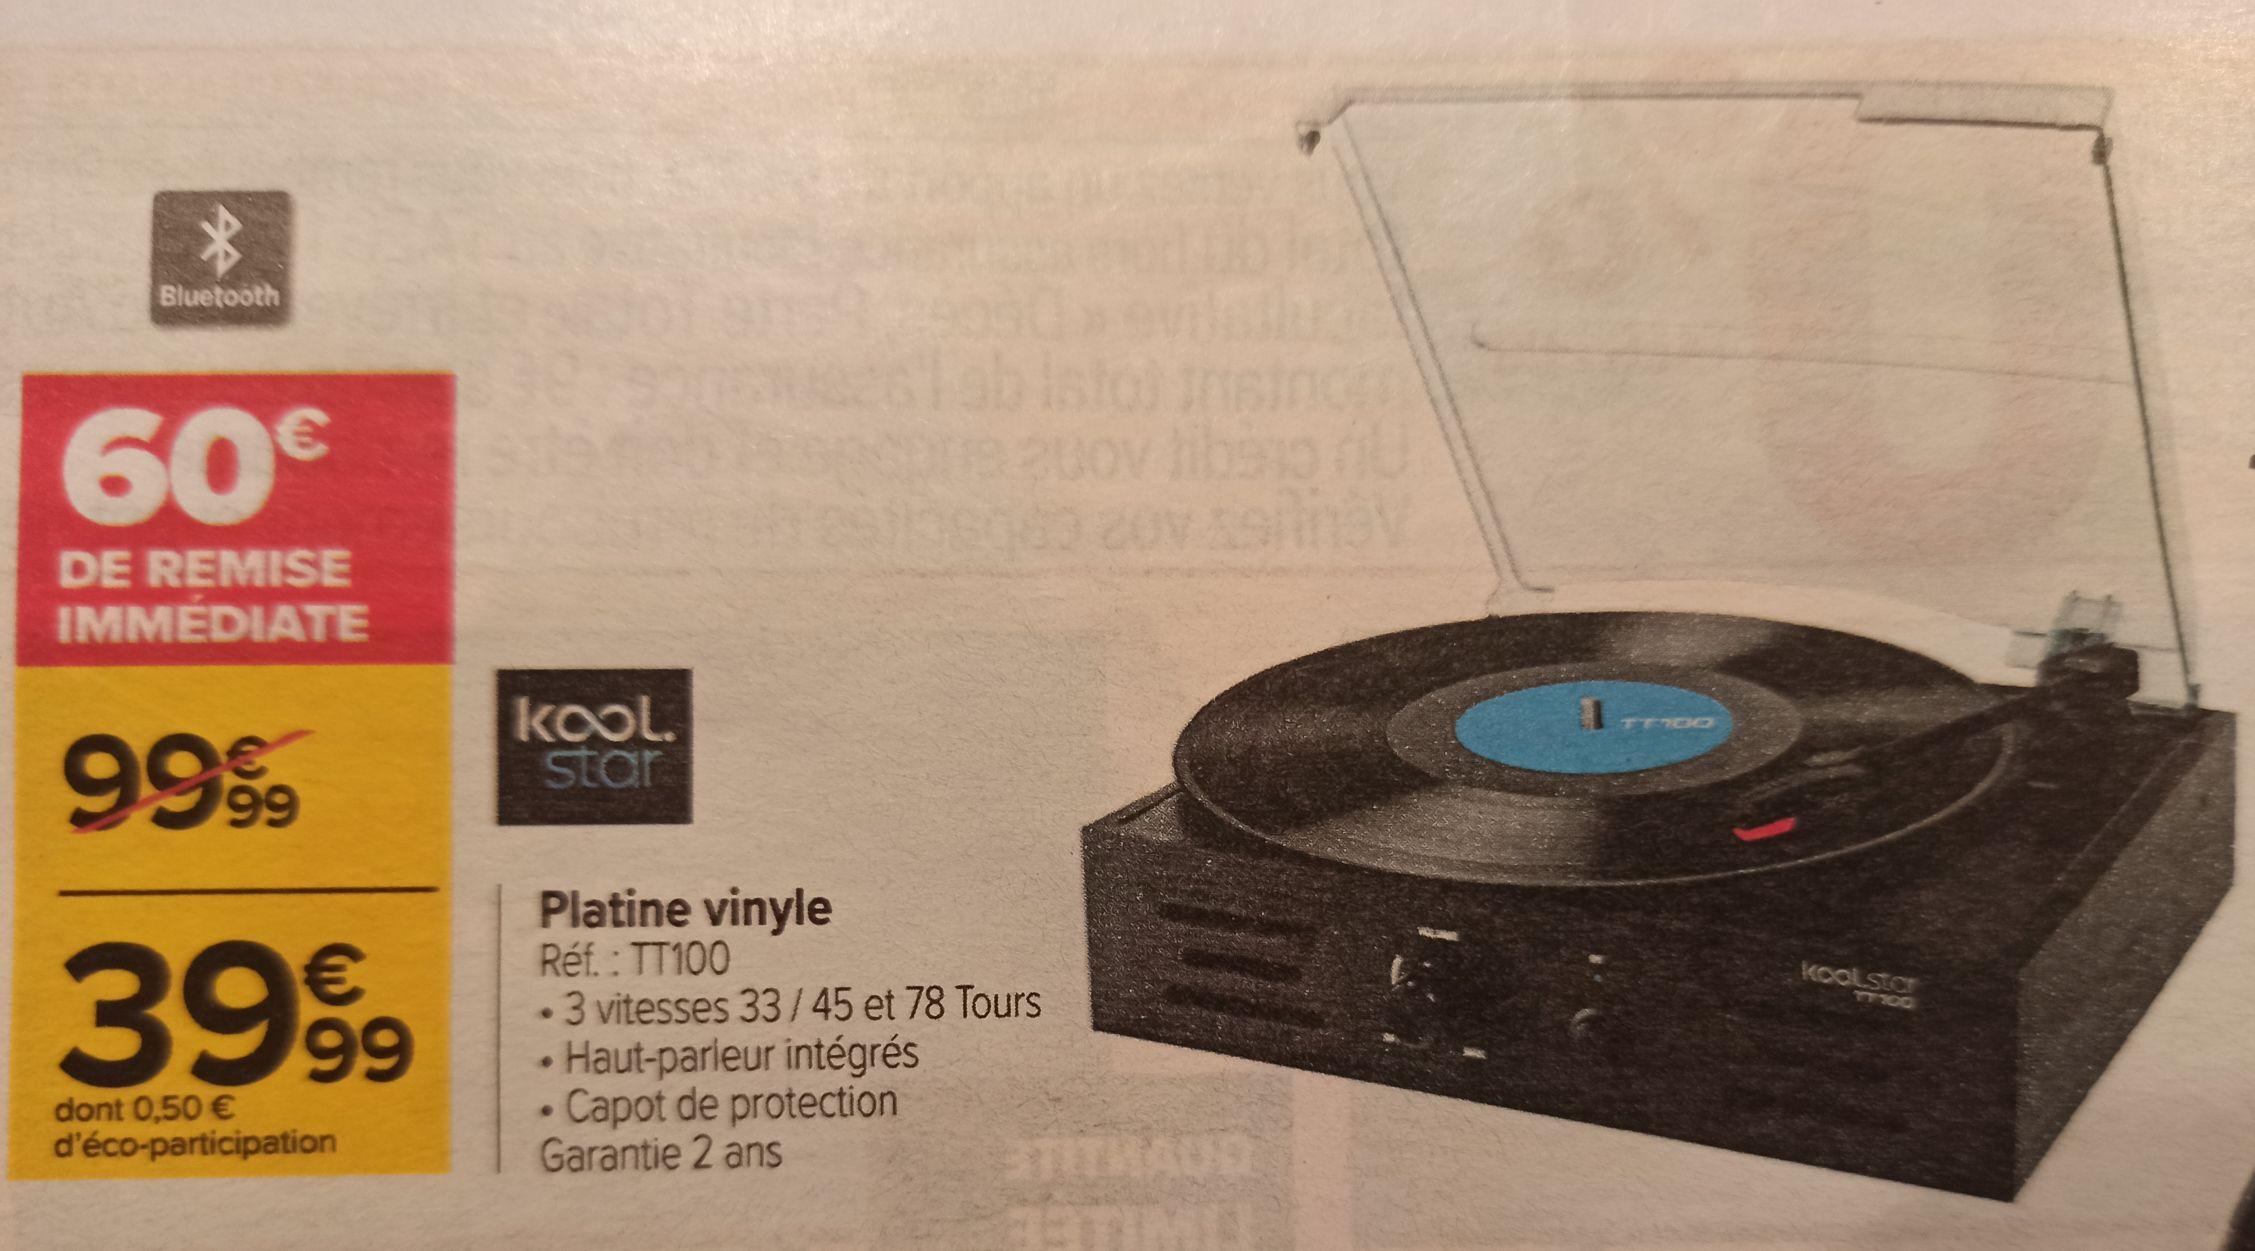 Platine vinyle TT100